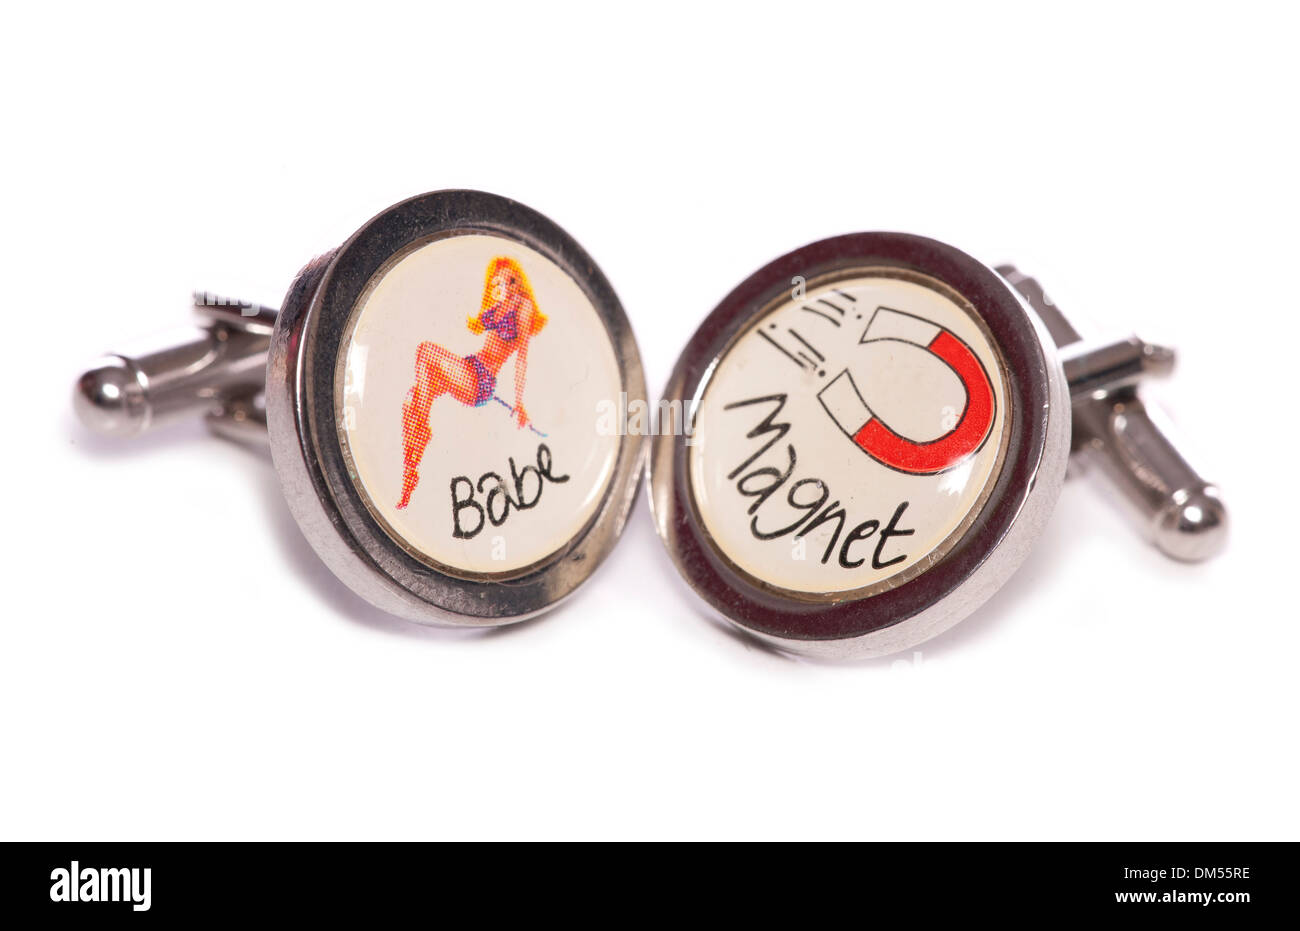 babe magnet cuff links studio cutout - Stock Image